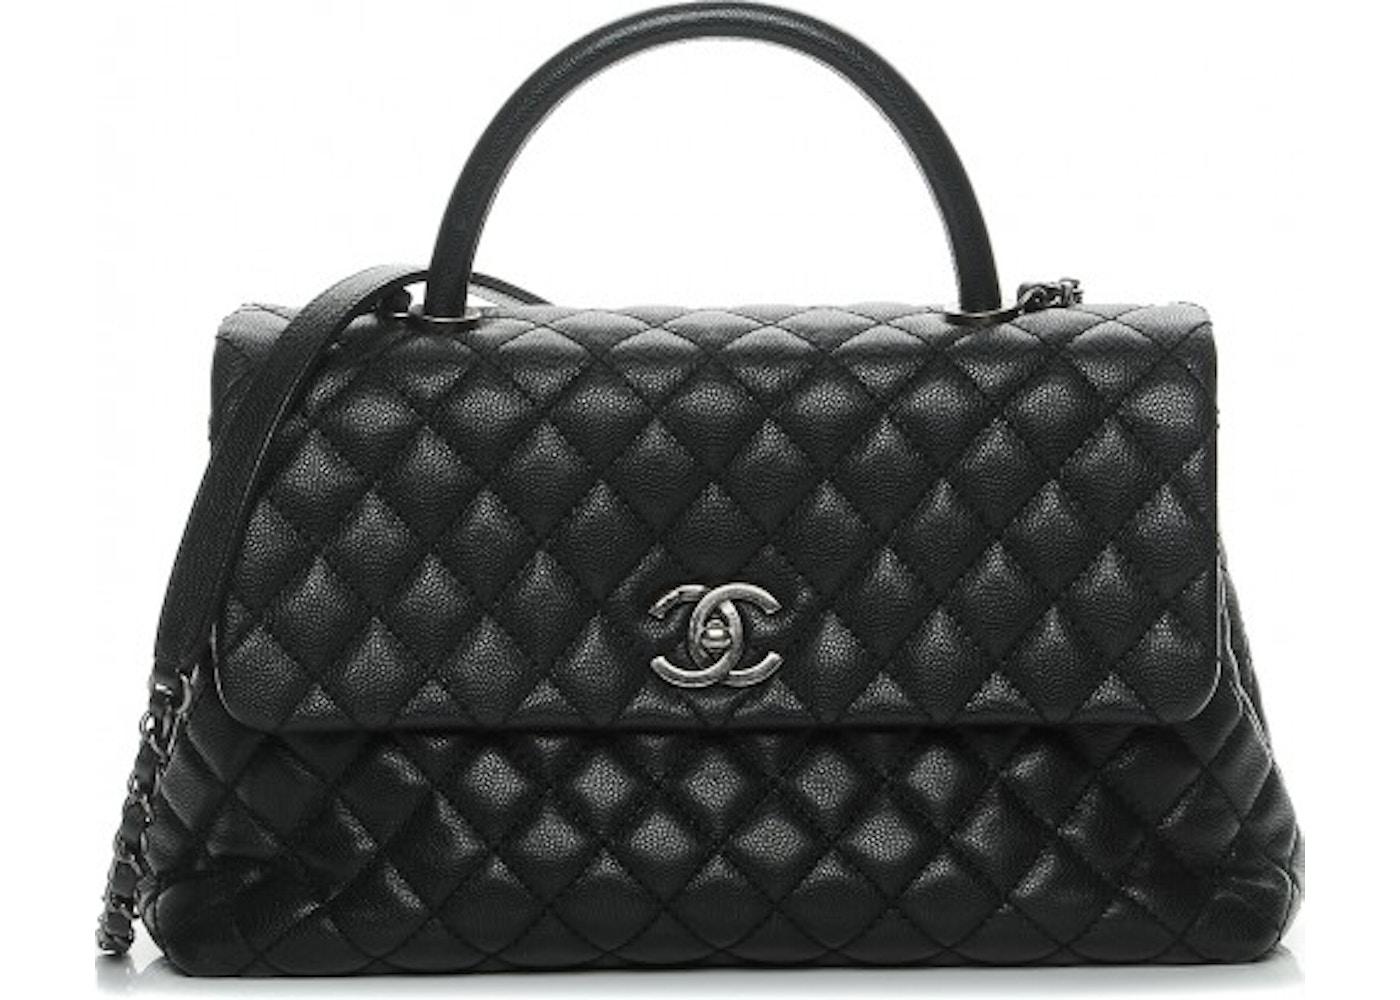 429f2be8f52c Chanel Coco Handle Flap Diamond Quilted Medium Black. Diamond Quilted Medium  Black